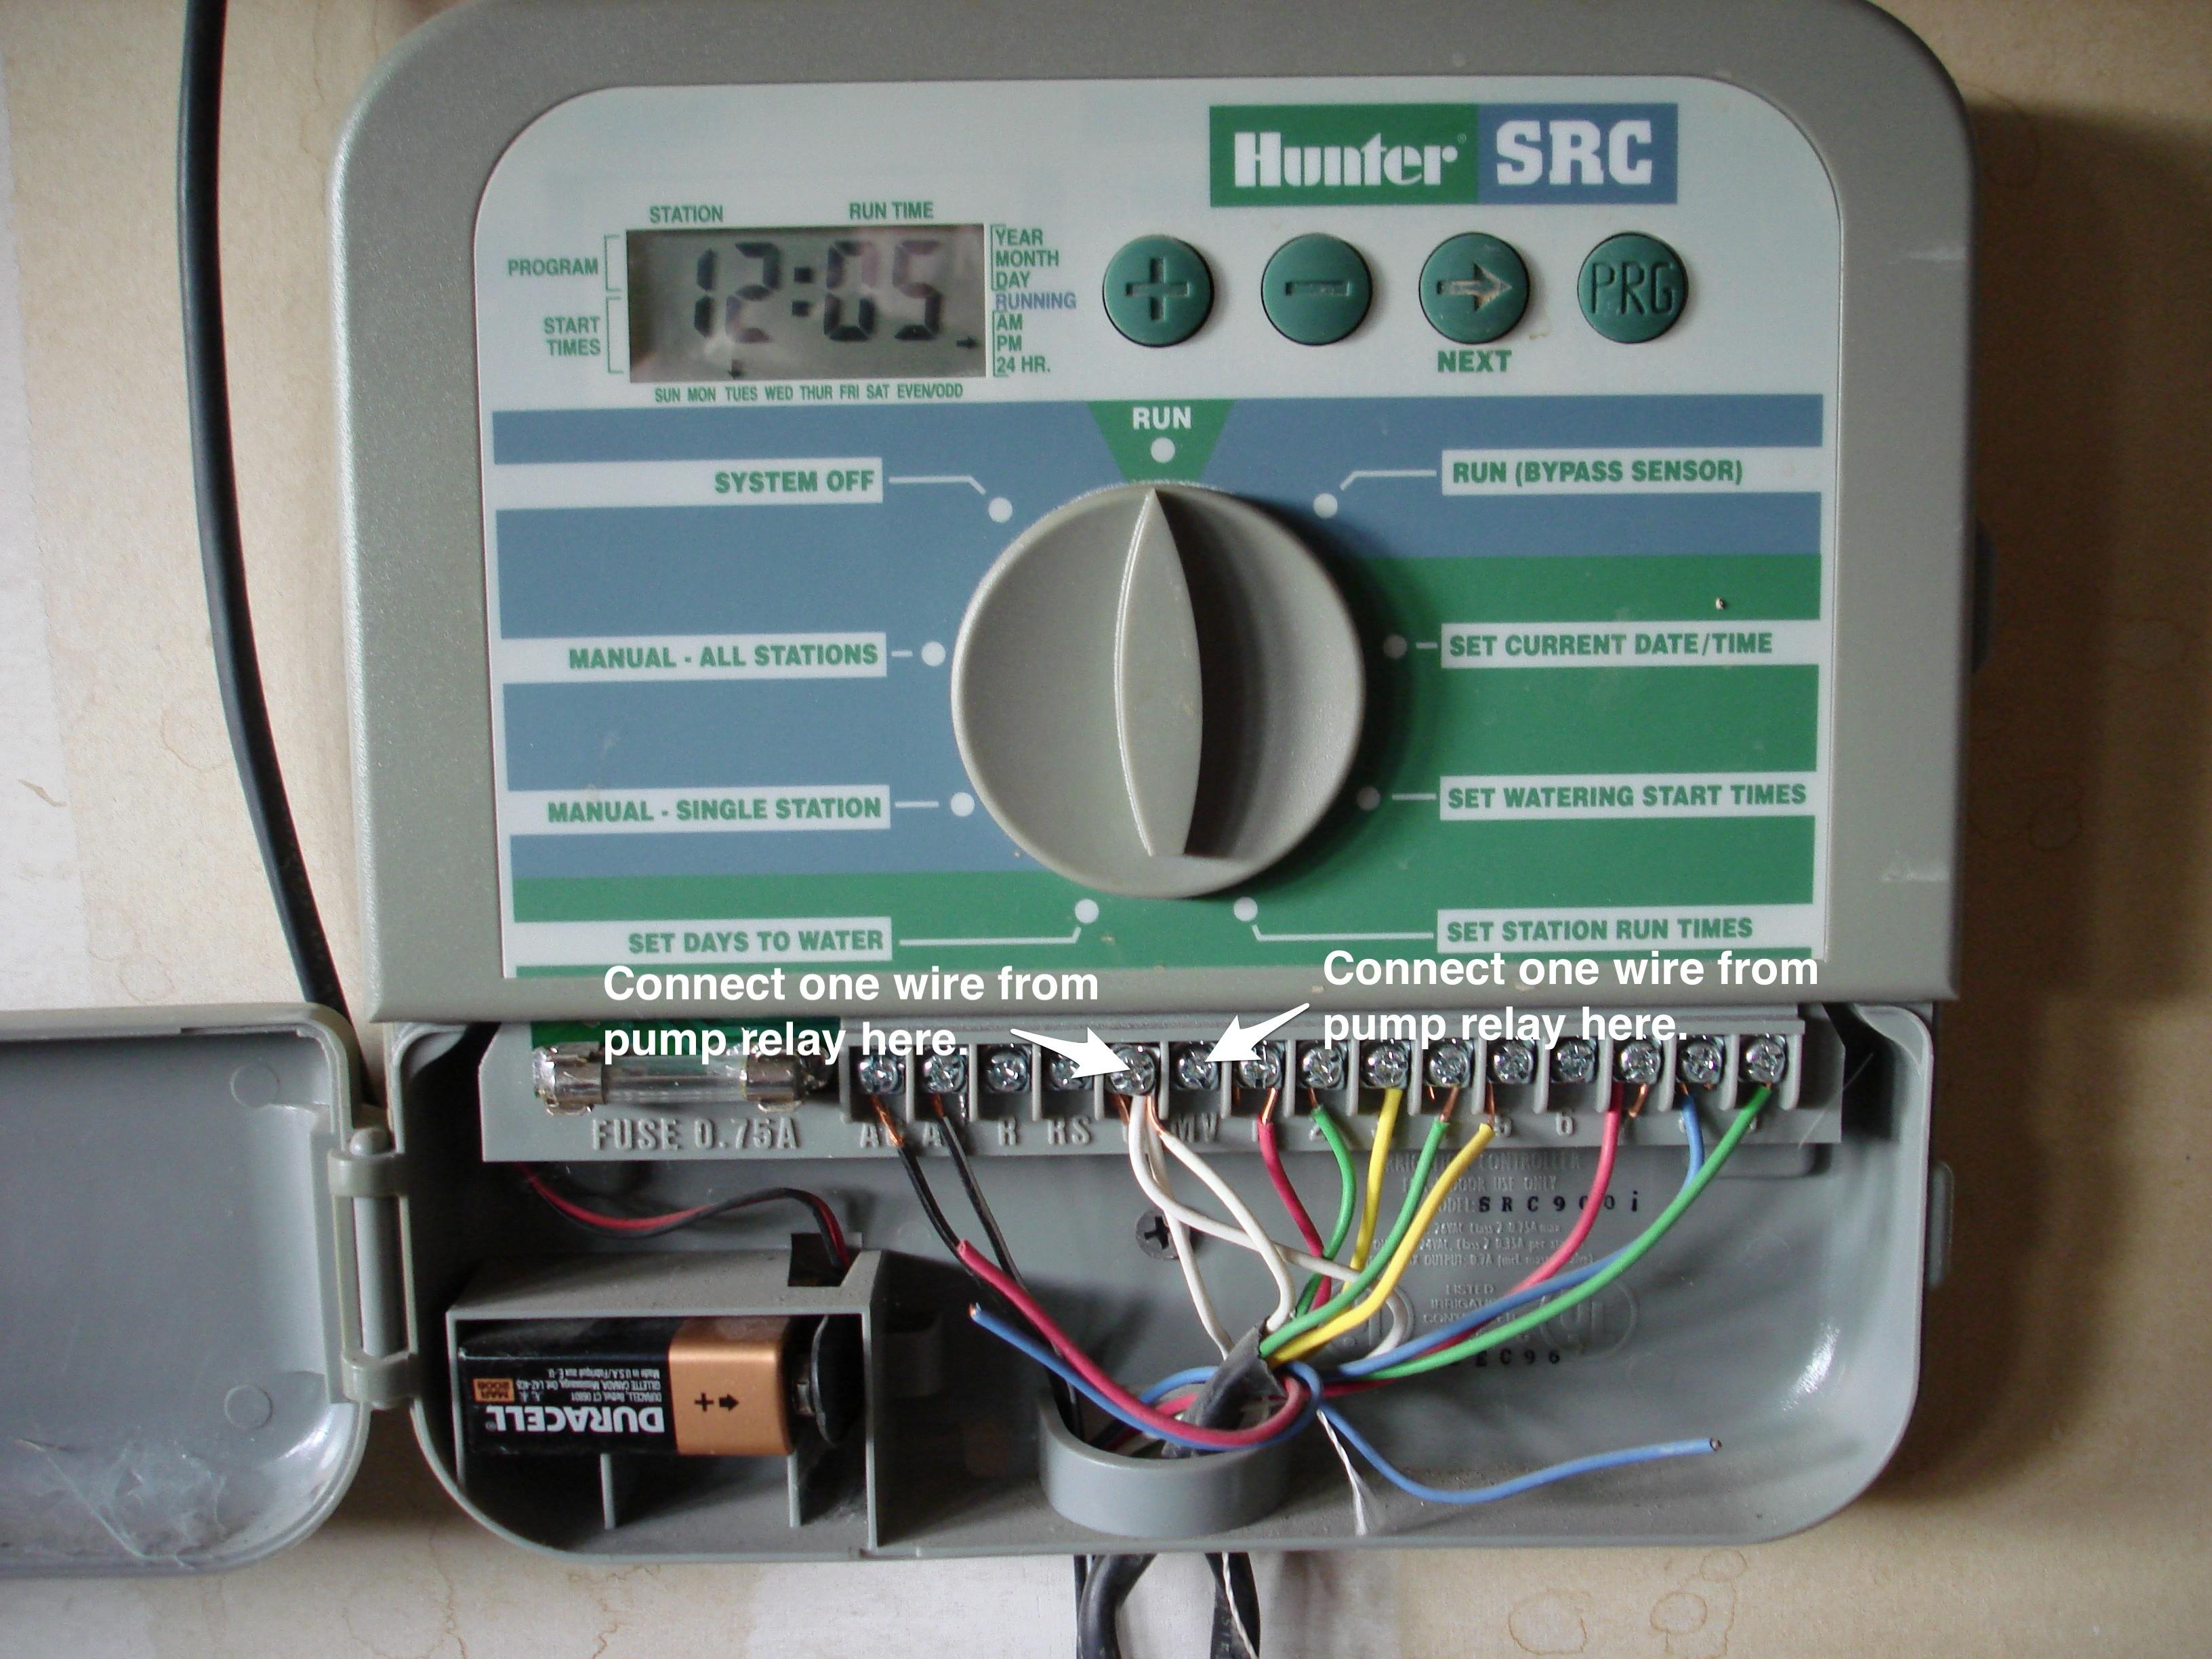 Orbit Pump Relay Wiring Diagram Sprinkler Master Pump Valve Wiring – iscaper Blog Of Orbit Pump Relay Wiring Diagram